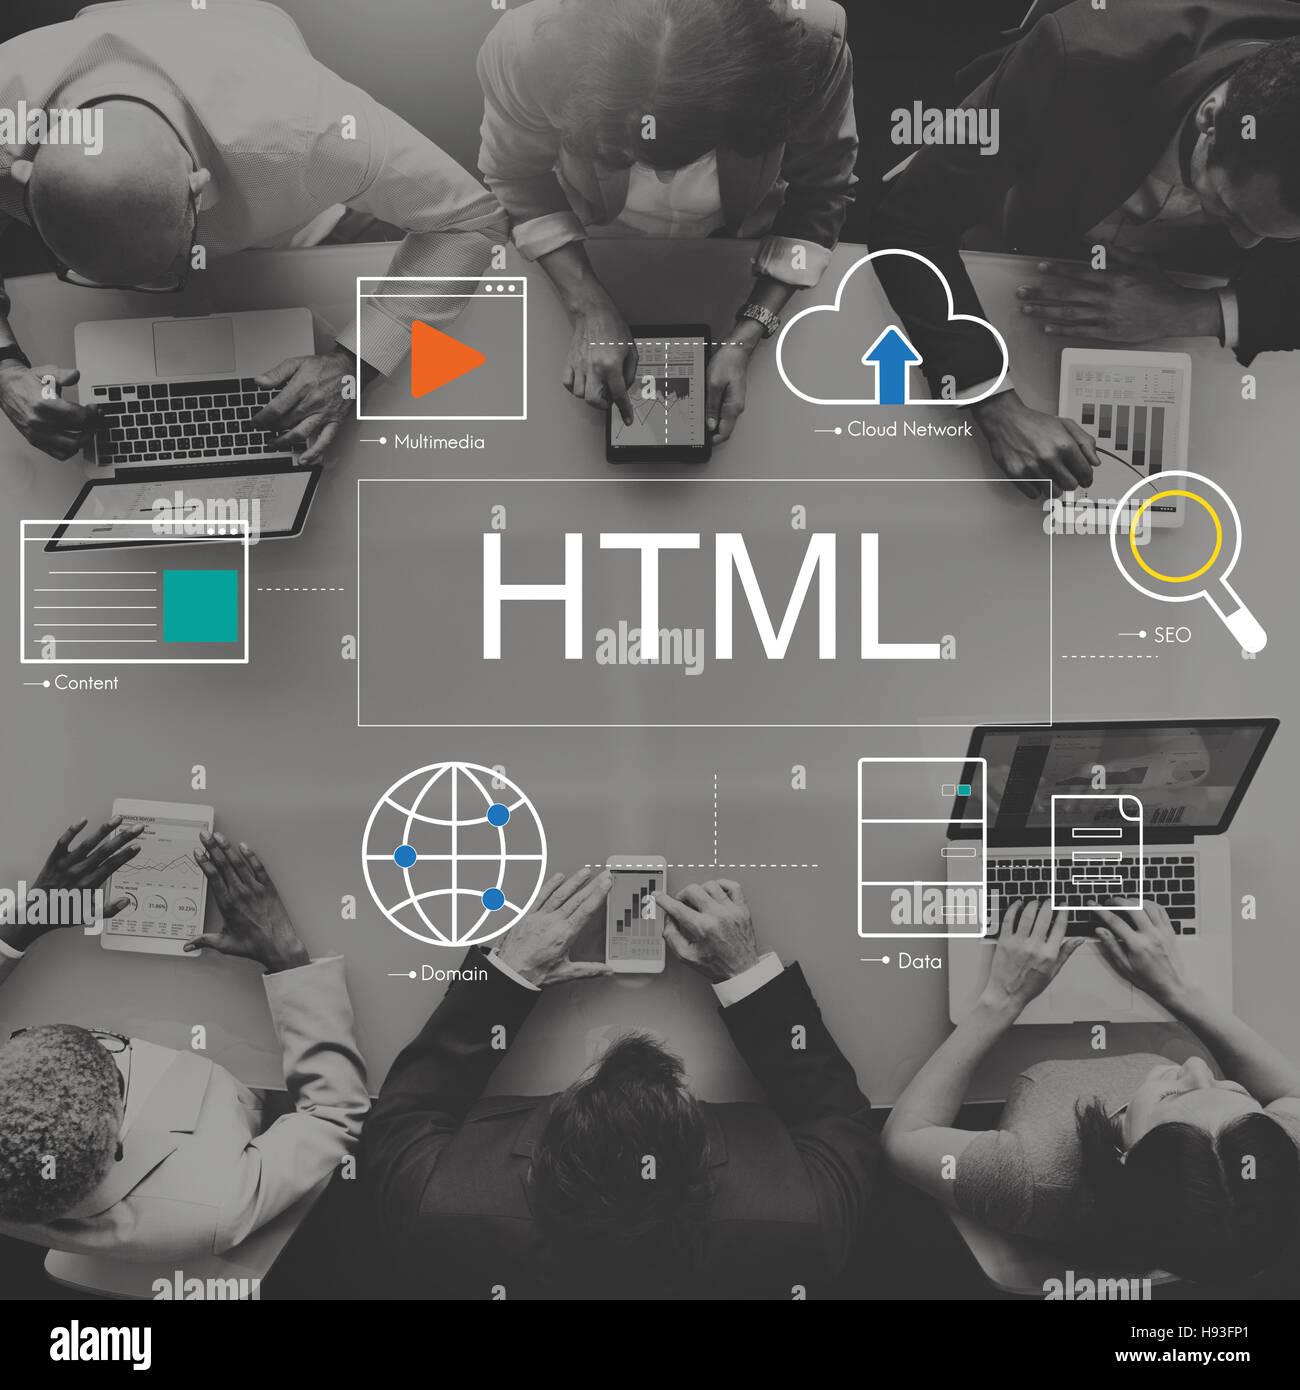 Big Data Domain Web Page SEO Concept - Stock Image